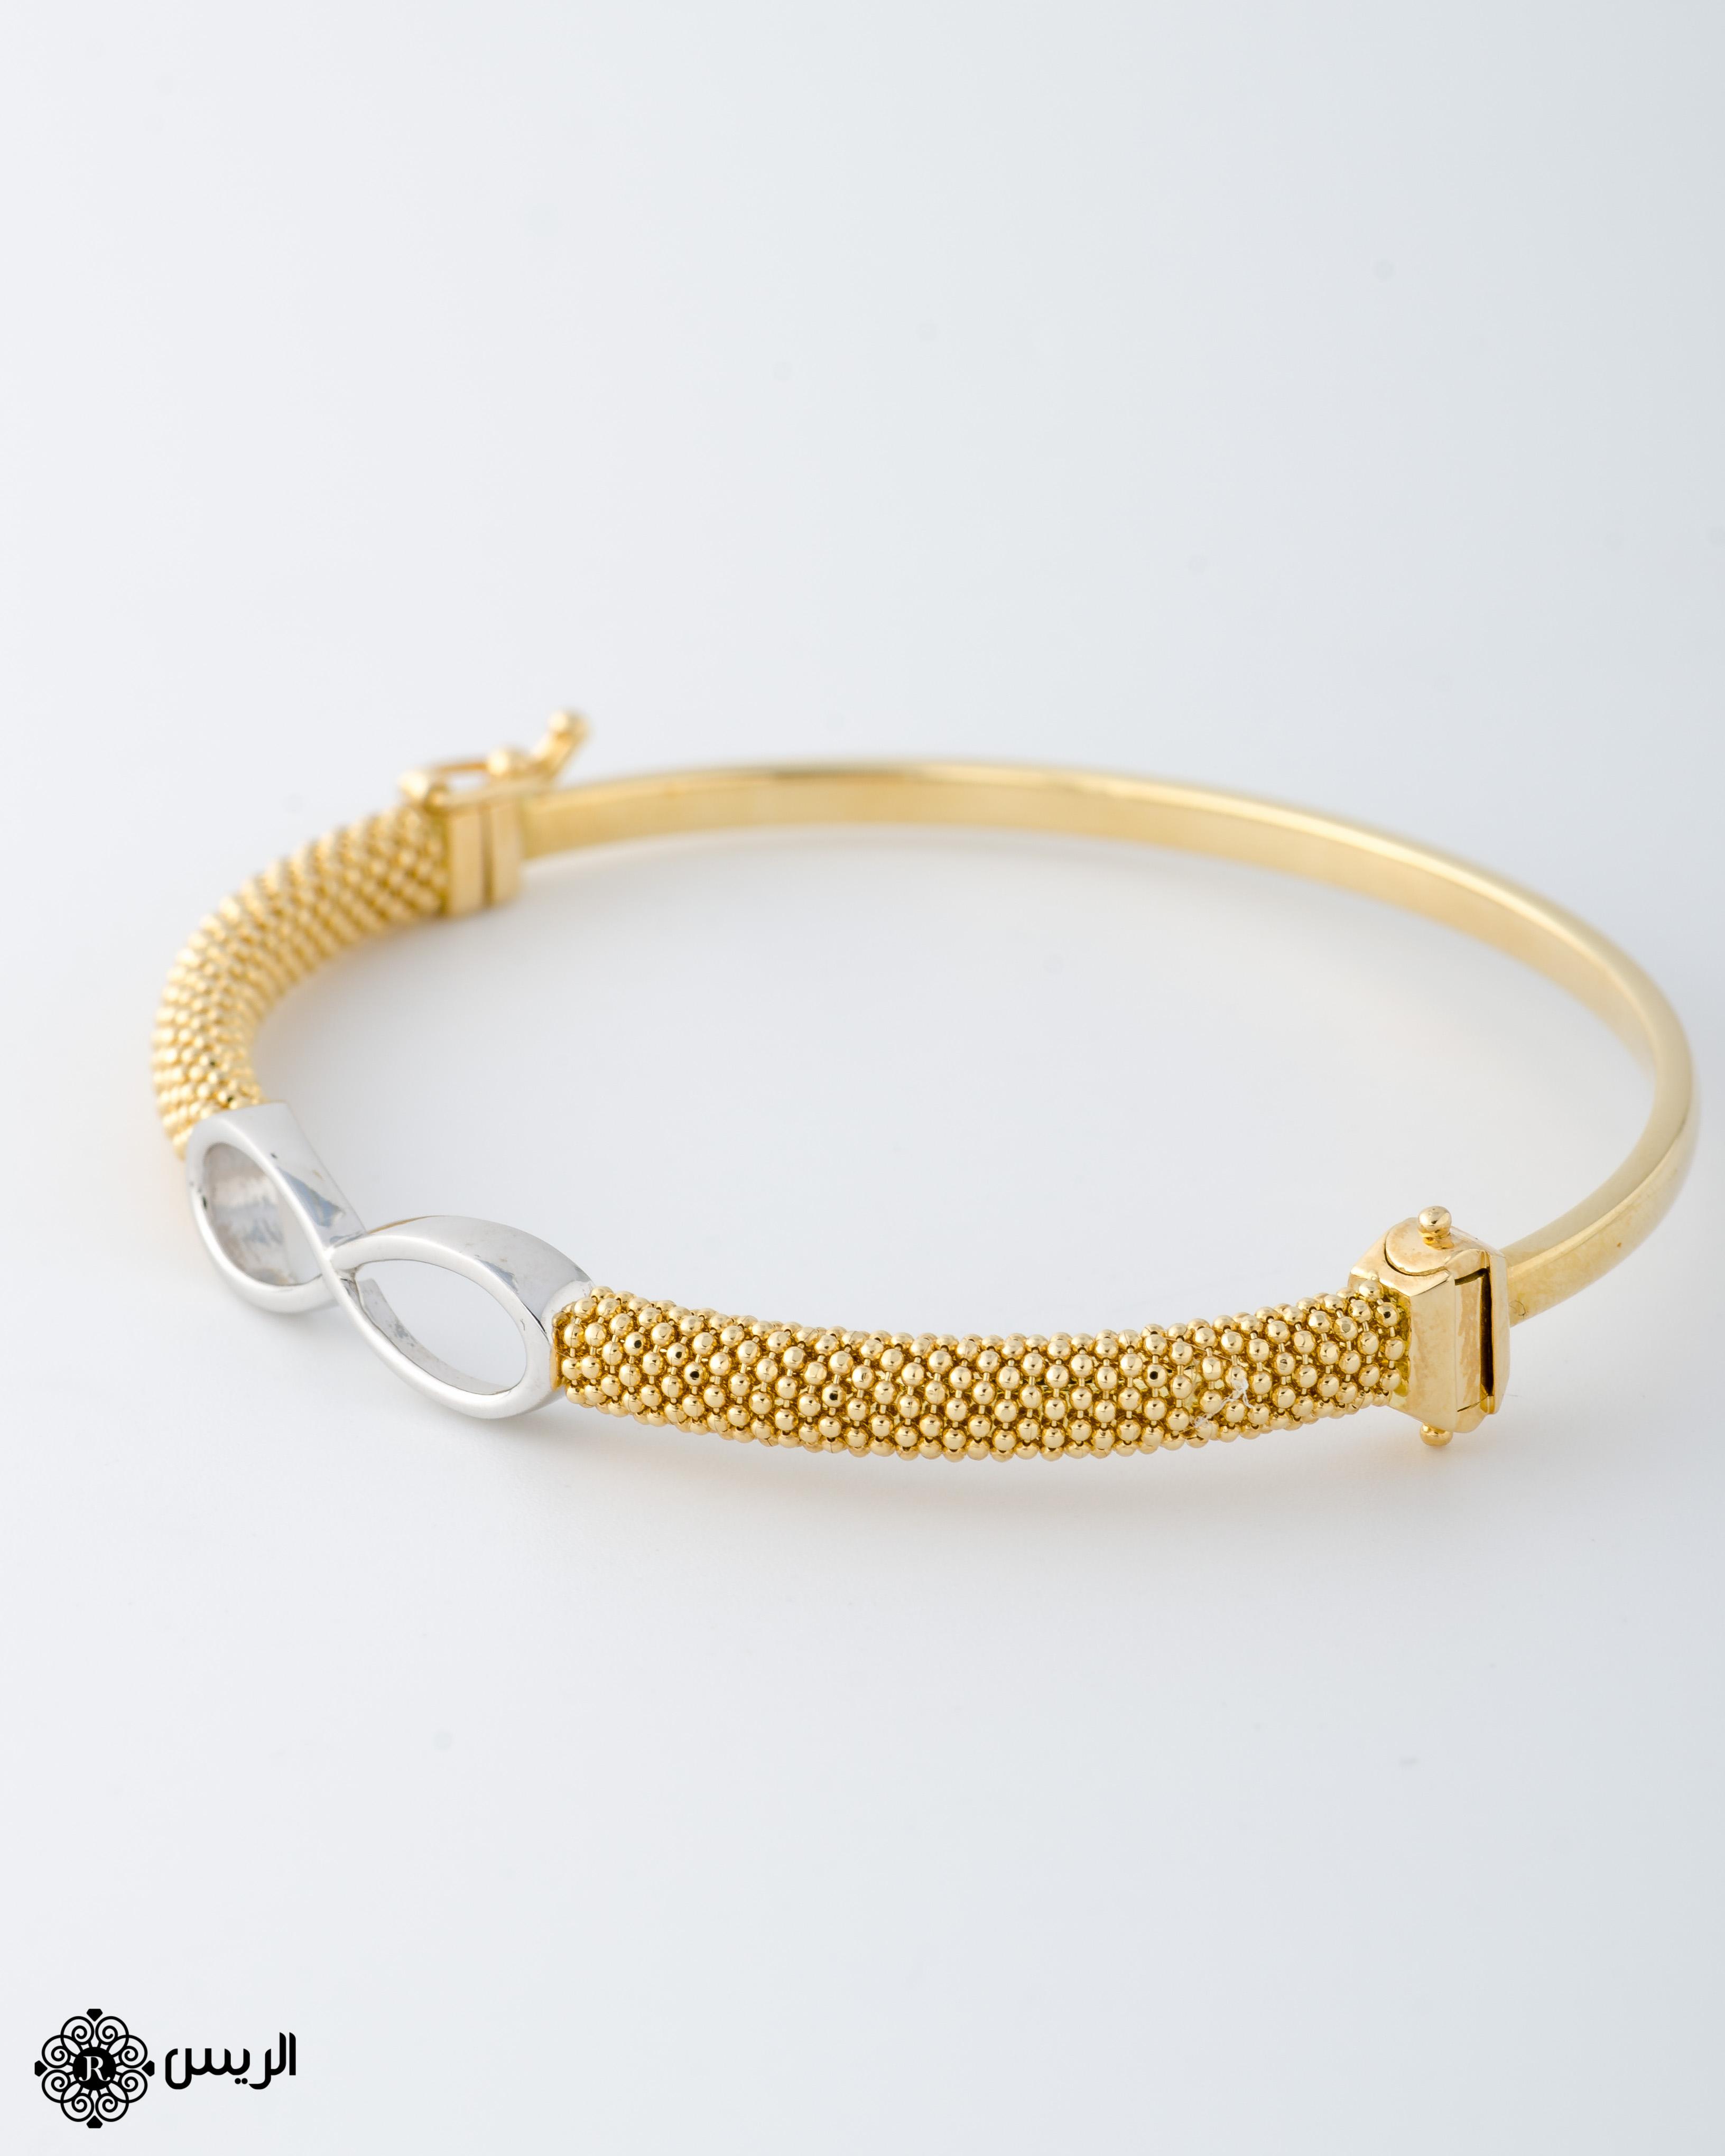 Raies jewelry Bangle Jessica Infinity إسورة جيسيكا إنفينيتي الريس للمجوهرات